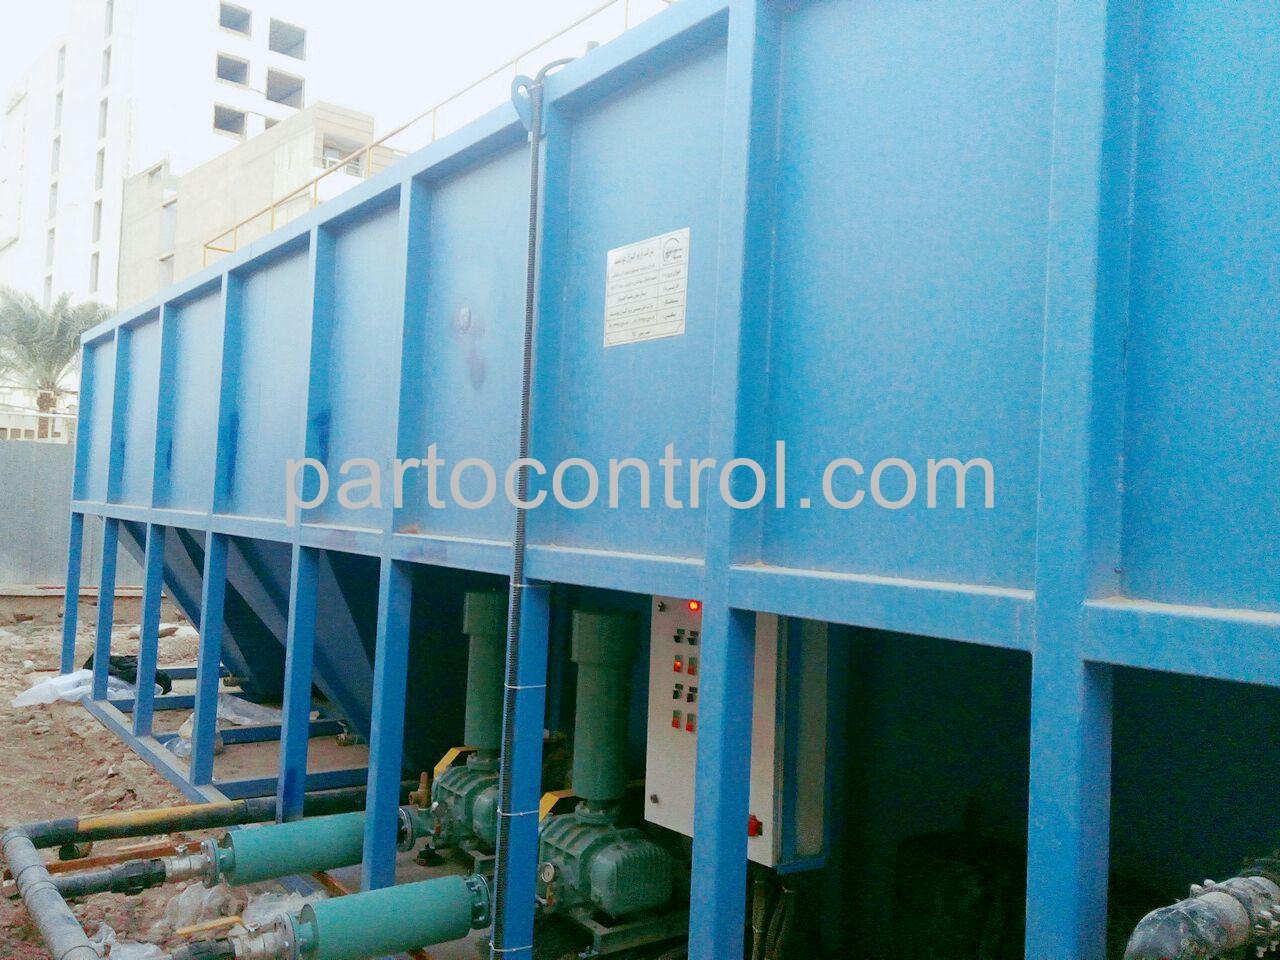 Hospital Sewage Treatmentتصفیه فاضلاب بیمارستانی بیمارستان شفا2 - پروژه تصفیه فاضلاب بیمارستانی